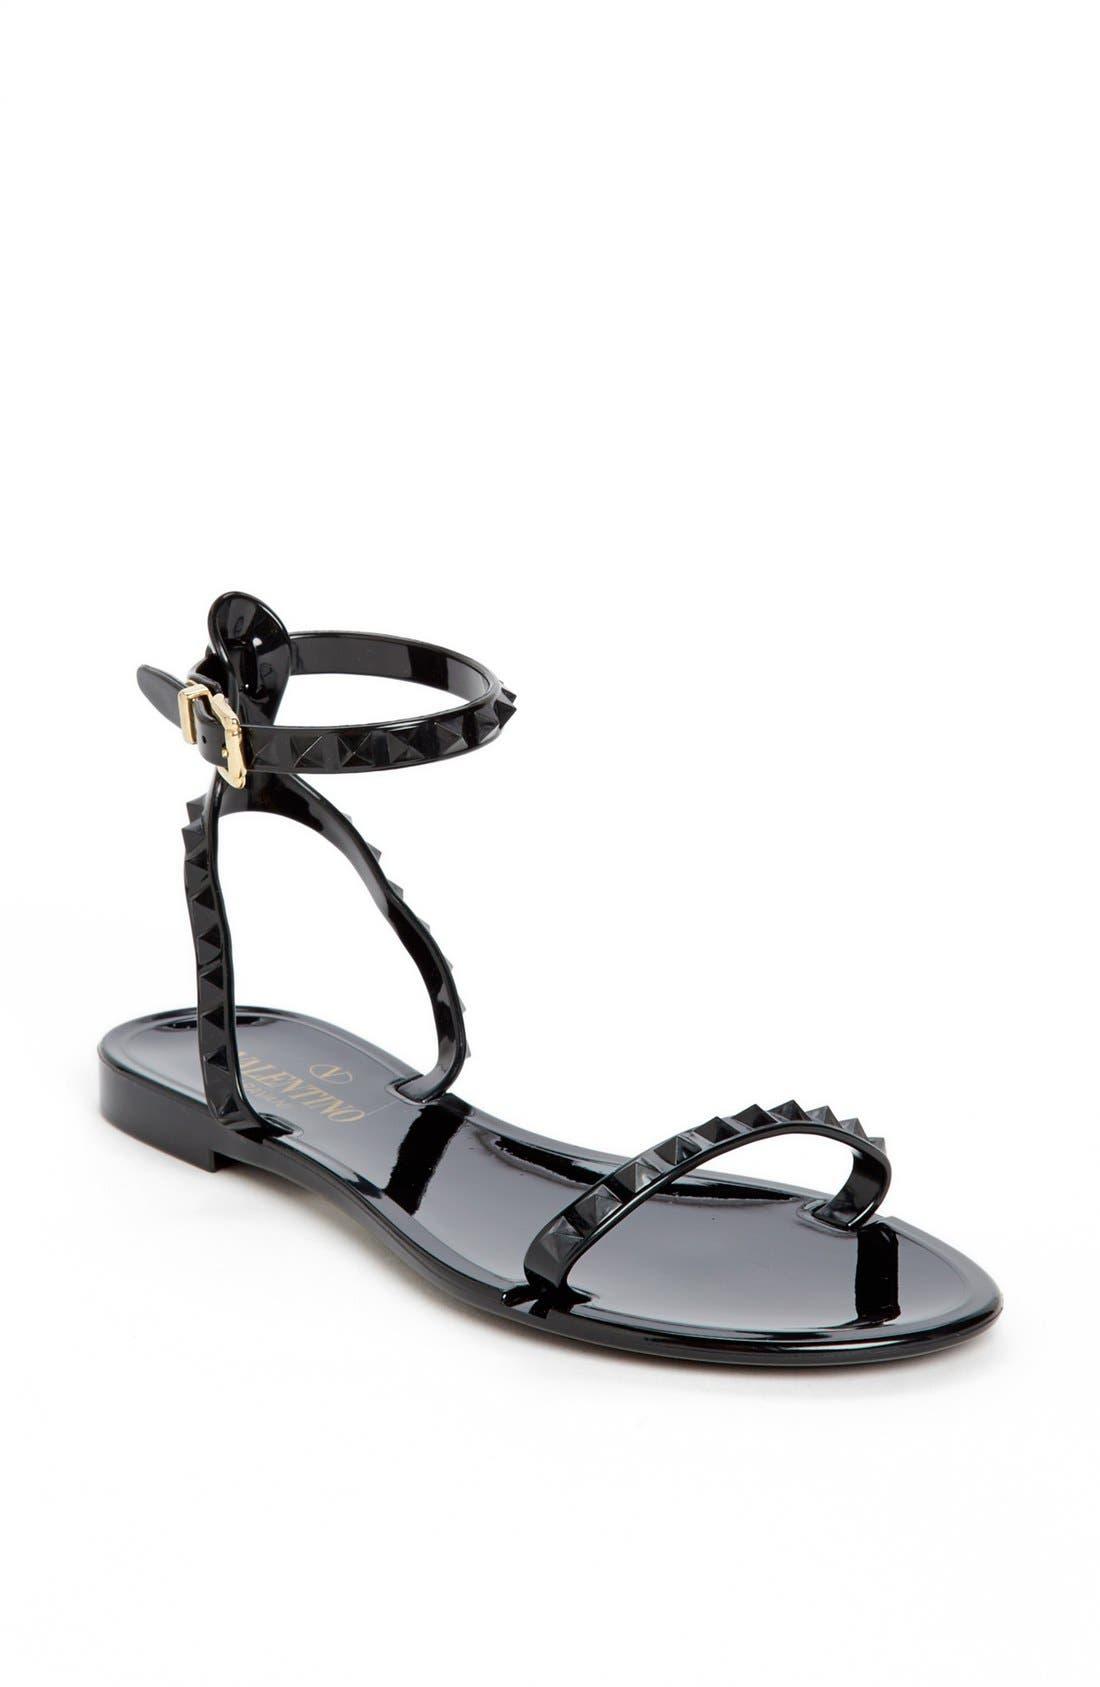 Alternate Image 1 Selected - Valentino 'Rockstud' Ankle Strap Sandal